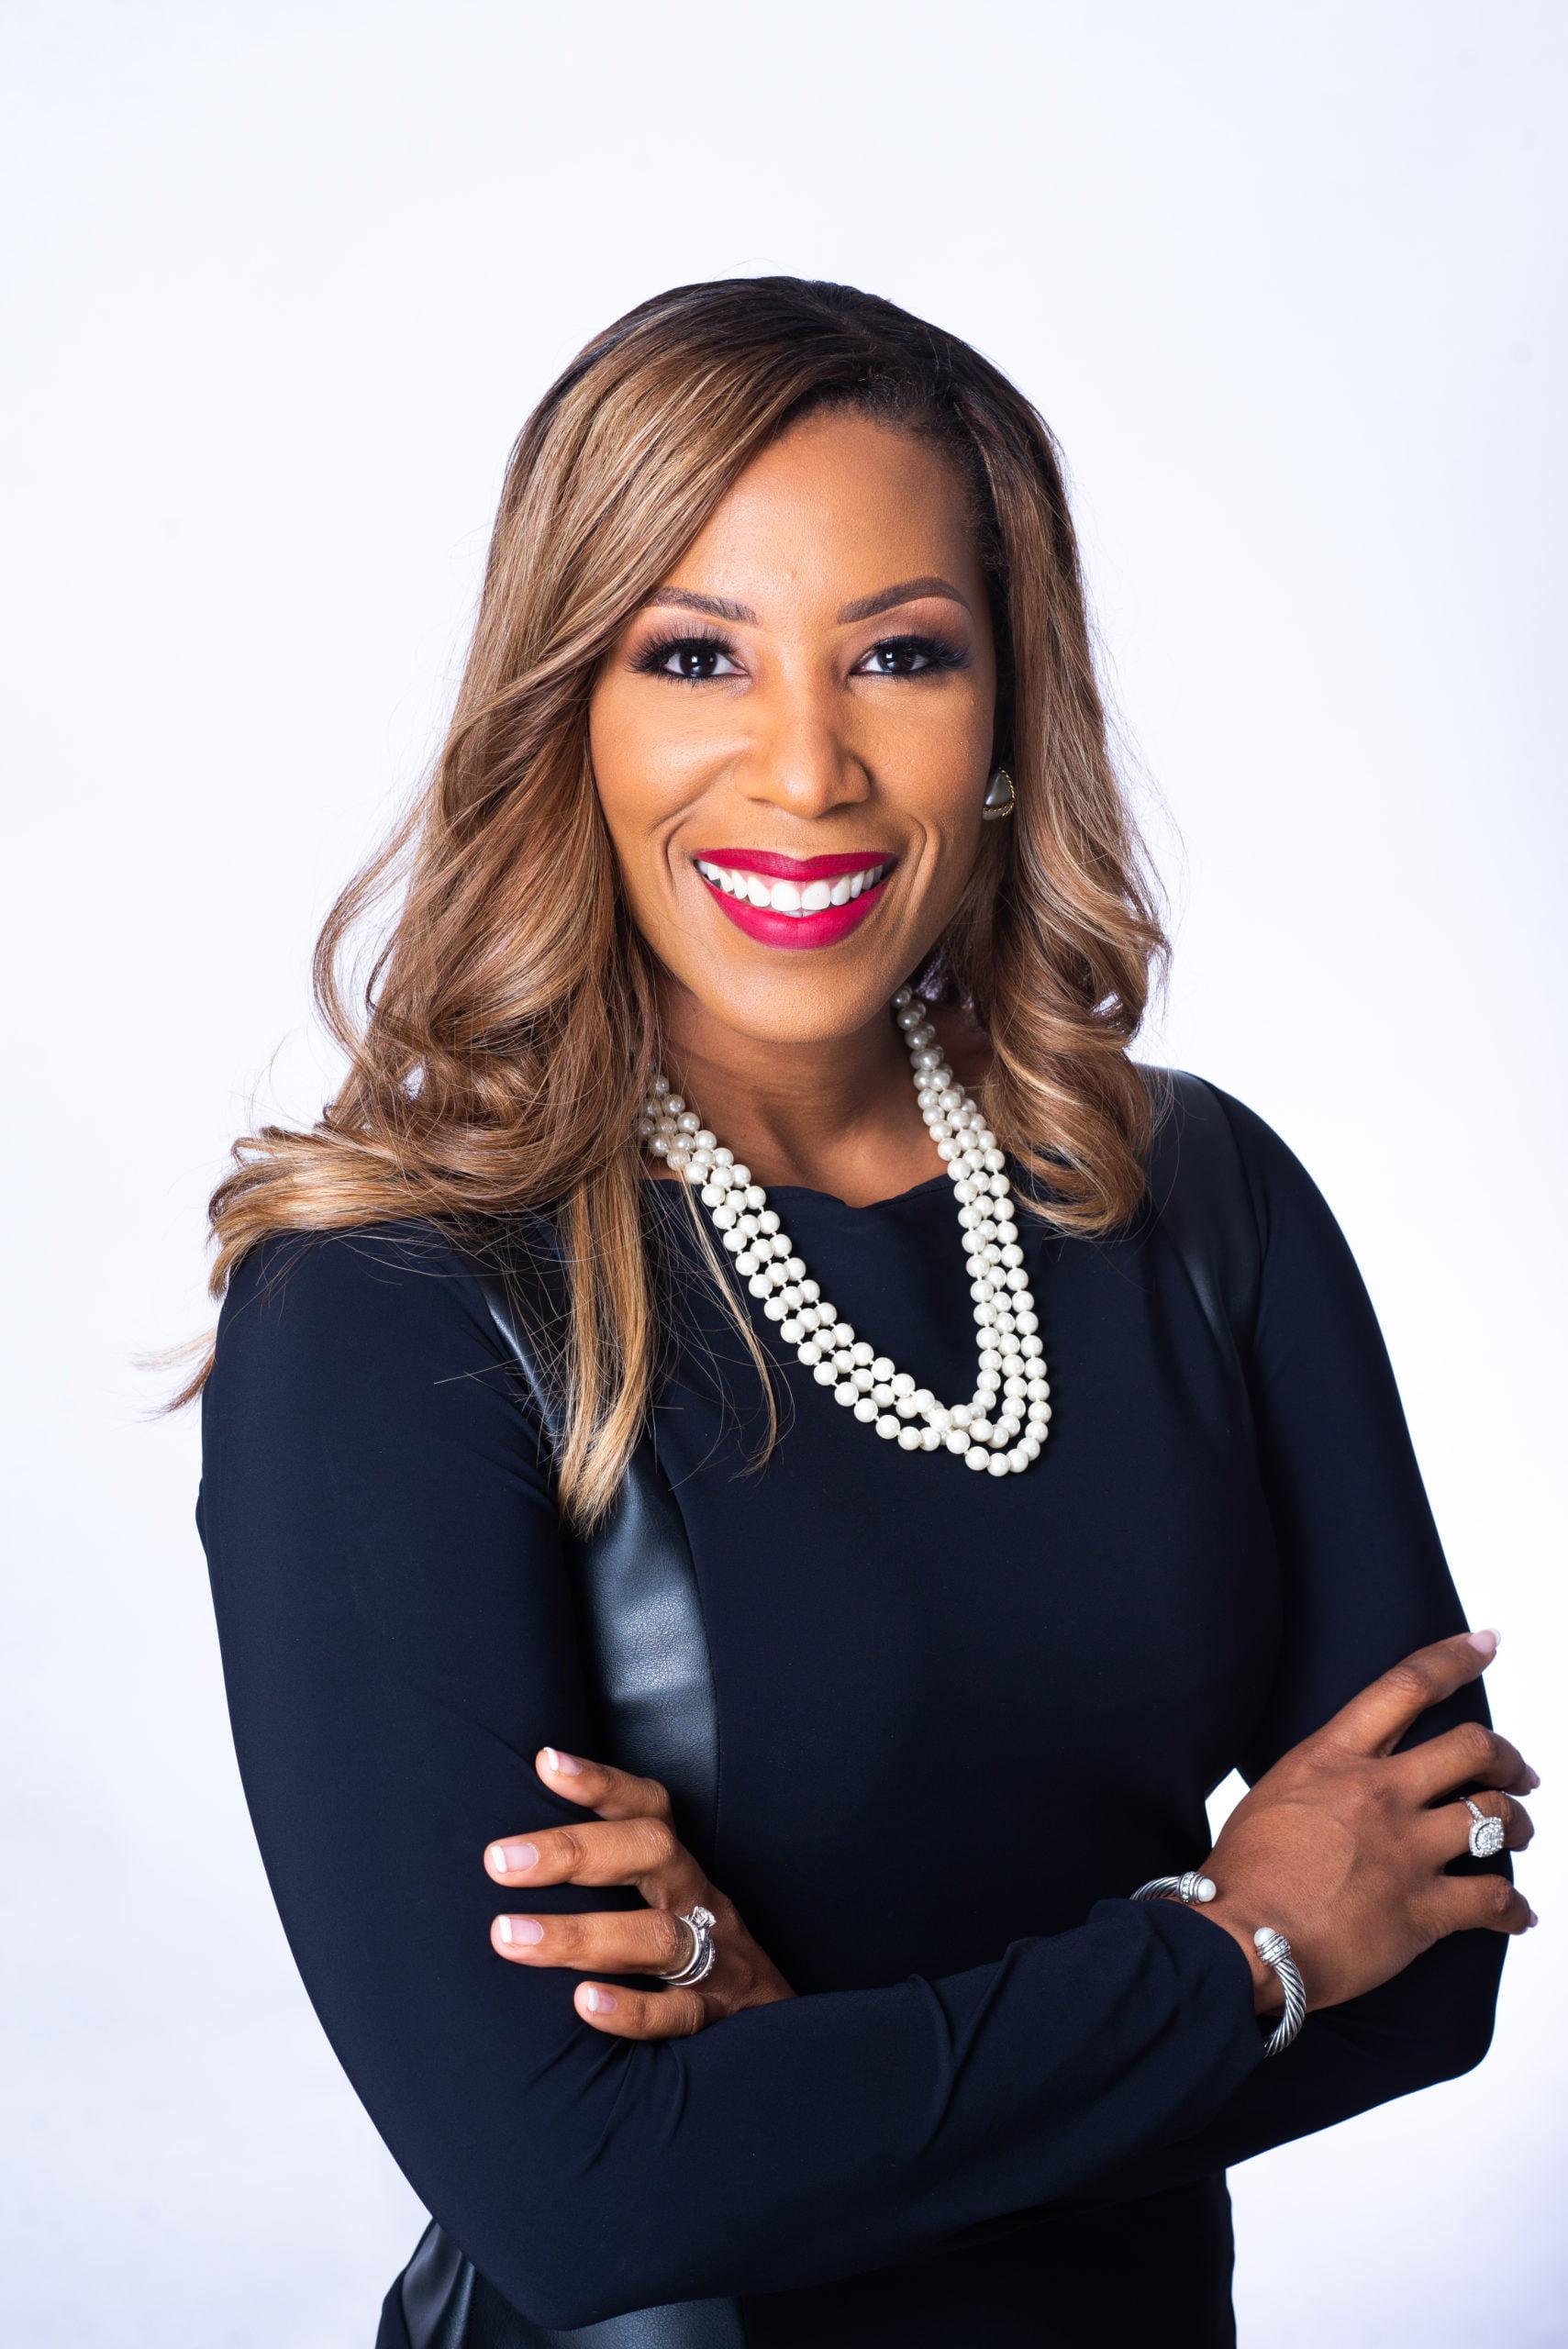 Sunshine Finance president elected to board International Women's Forum